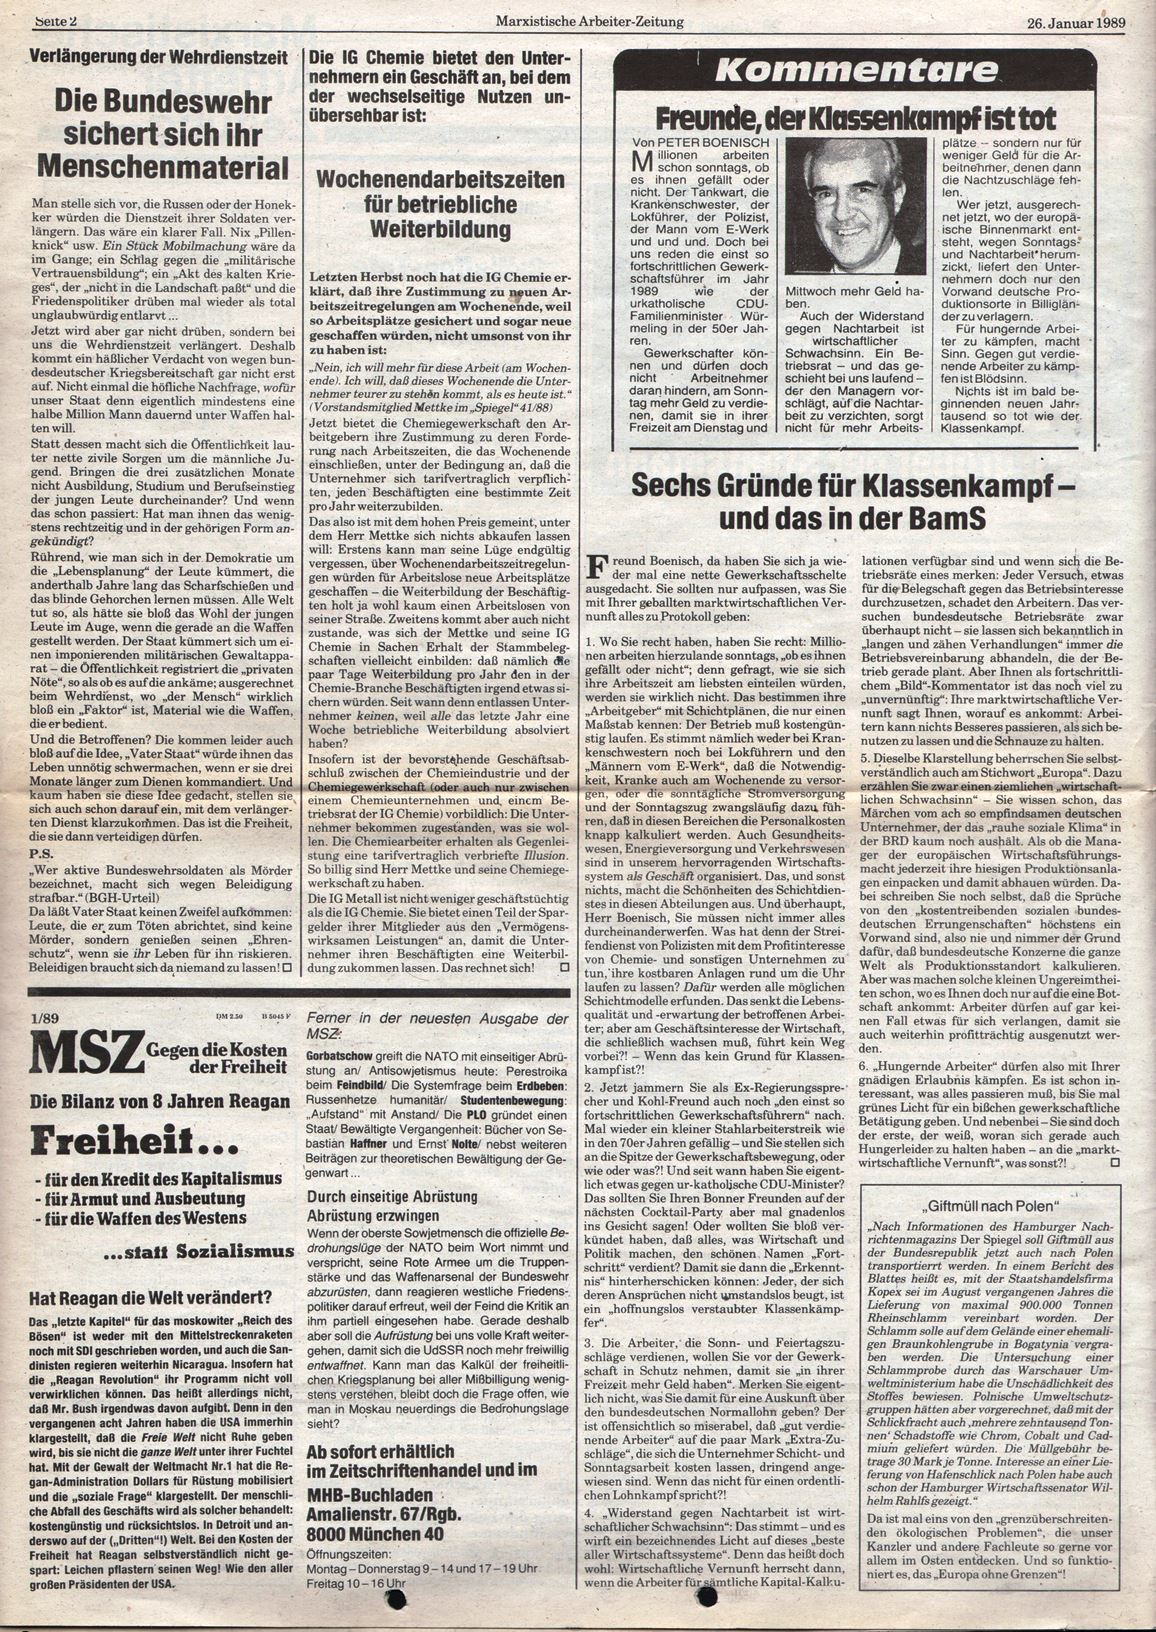 Muenchen_MG_MAZ_19890126_02